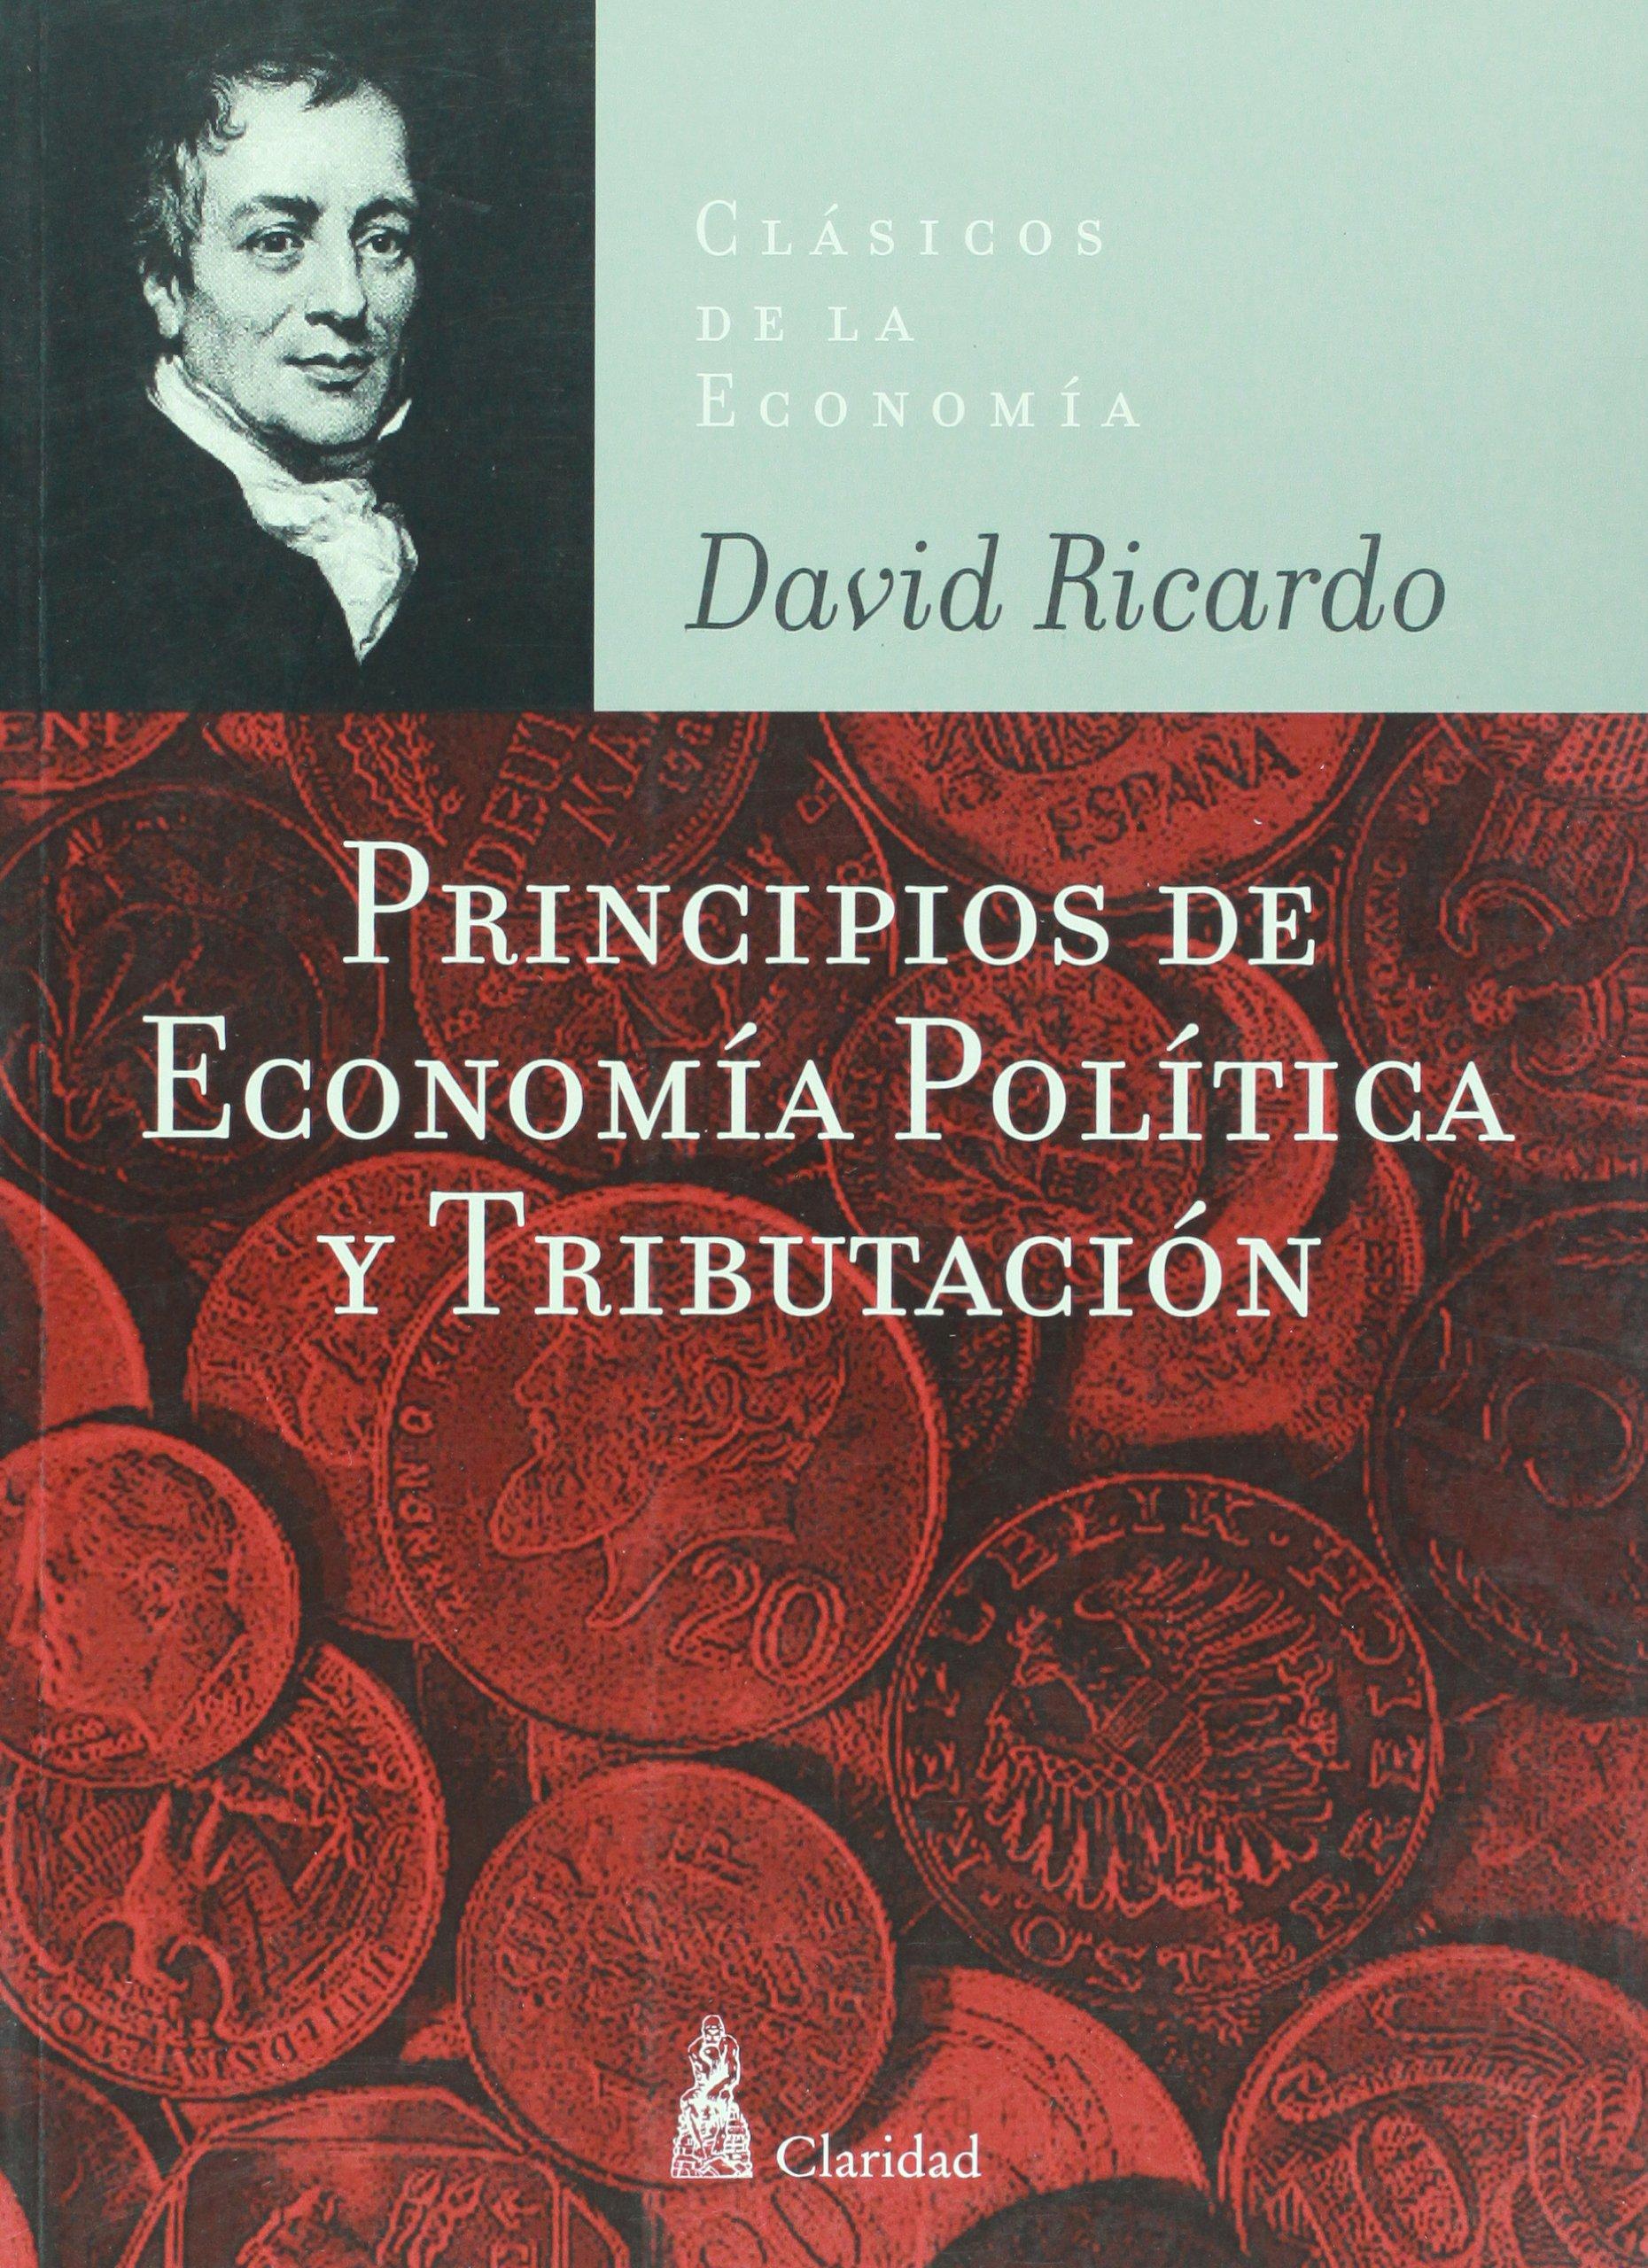 Download Principios de economia y tributacion (Clasicos de la economia / Economy Classics) (Spanish Edition) pdf epub